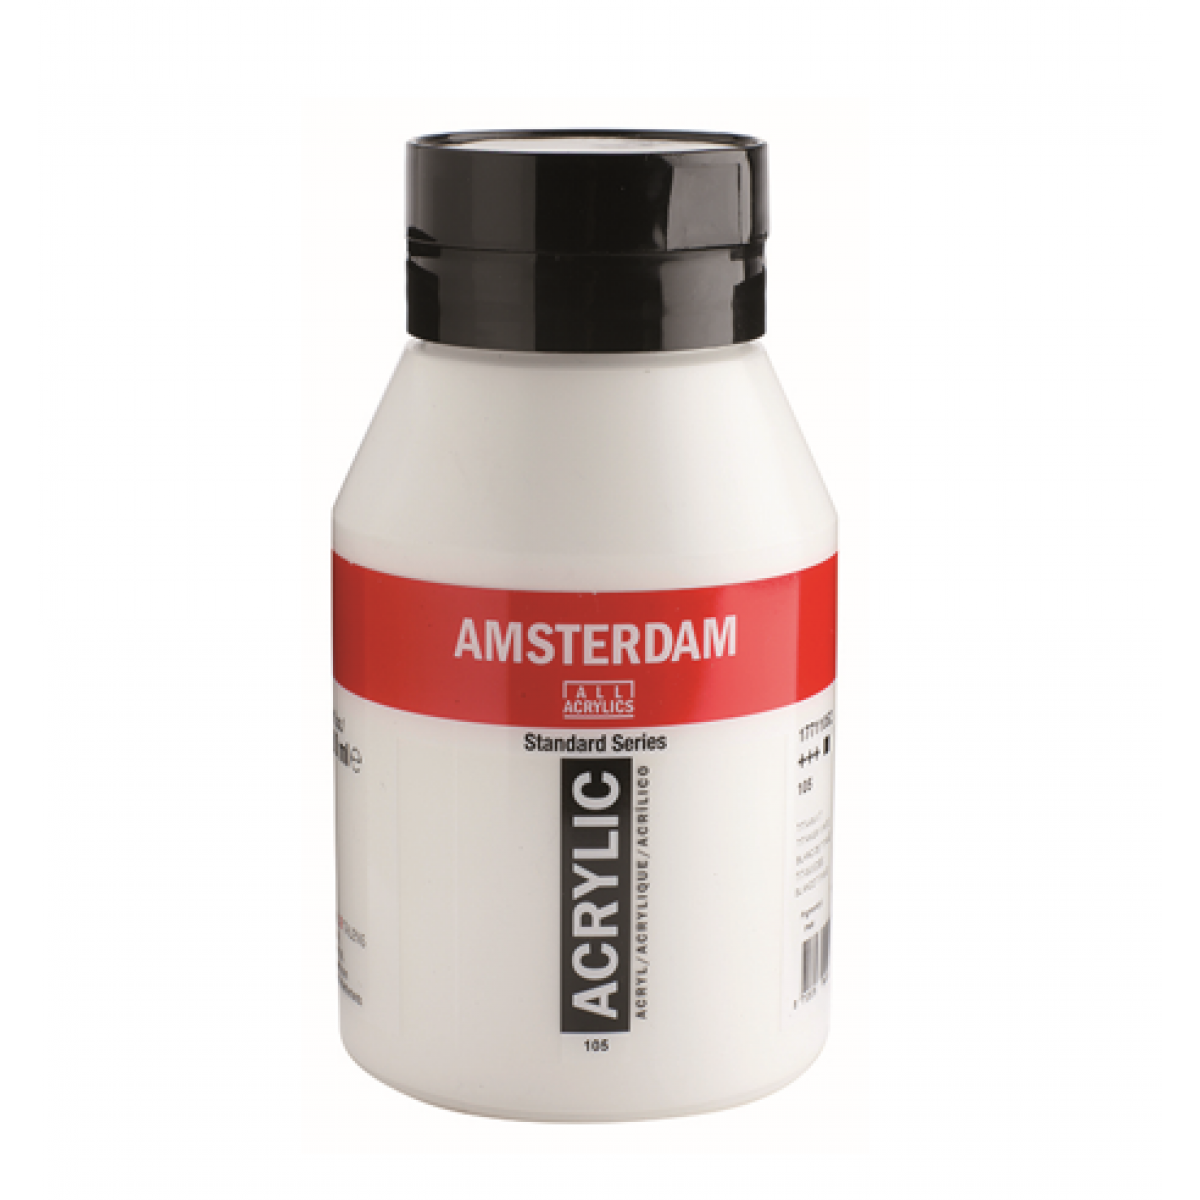 Amsterdam akrylmaling, Titanium white, 1000 ml. FAST LAVPRIS